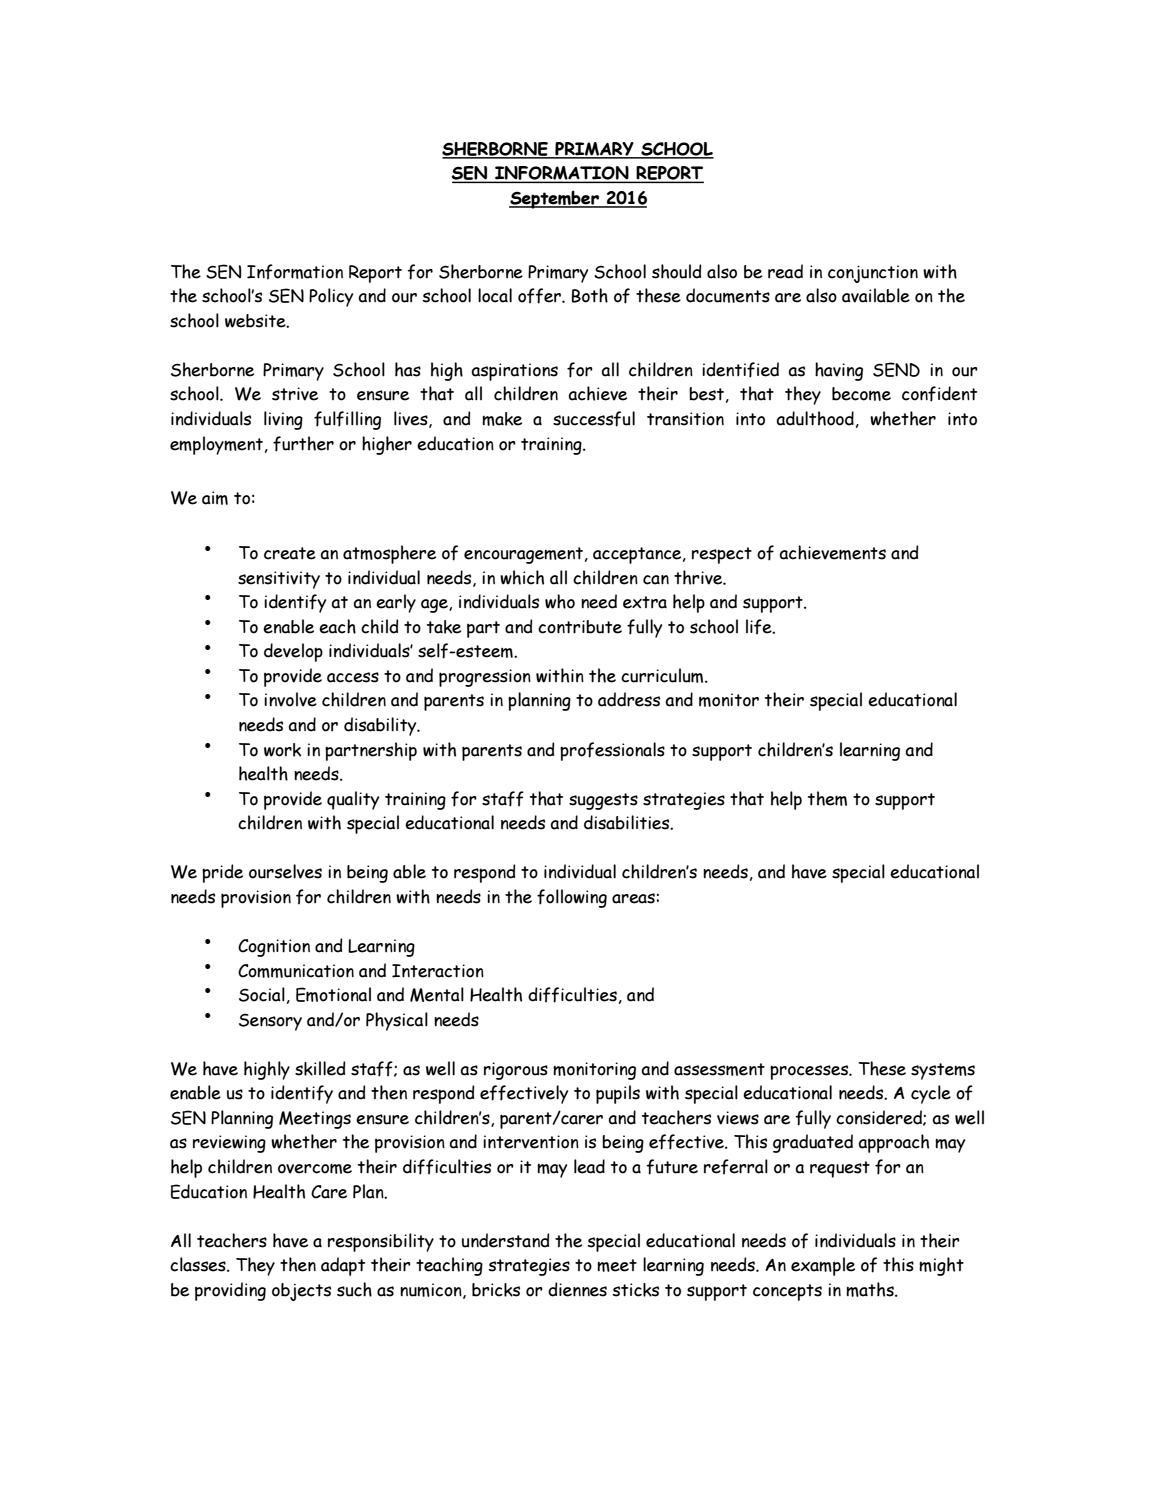 sen-information-report-december-2016 by jmaitland - issuu